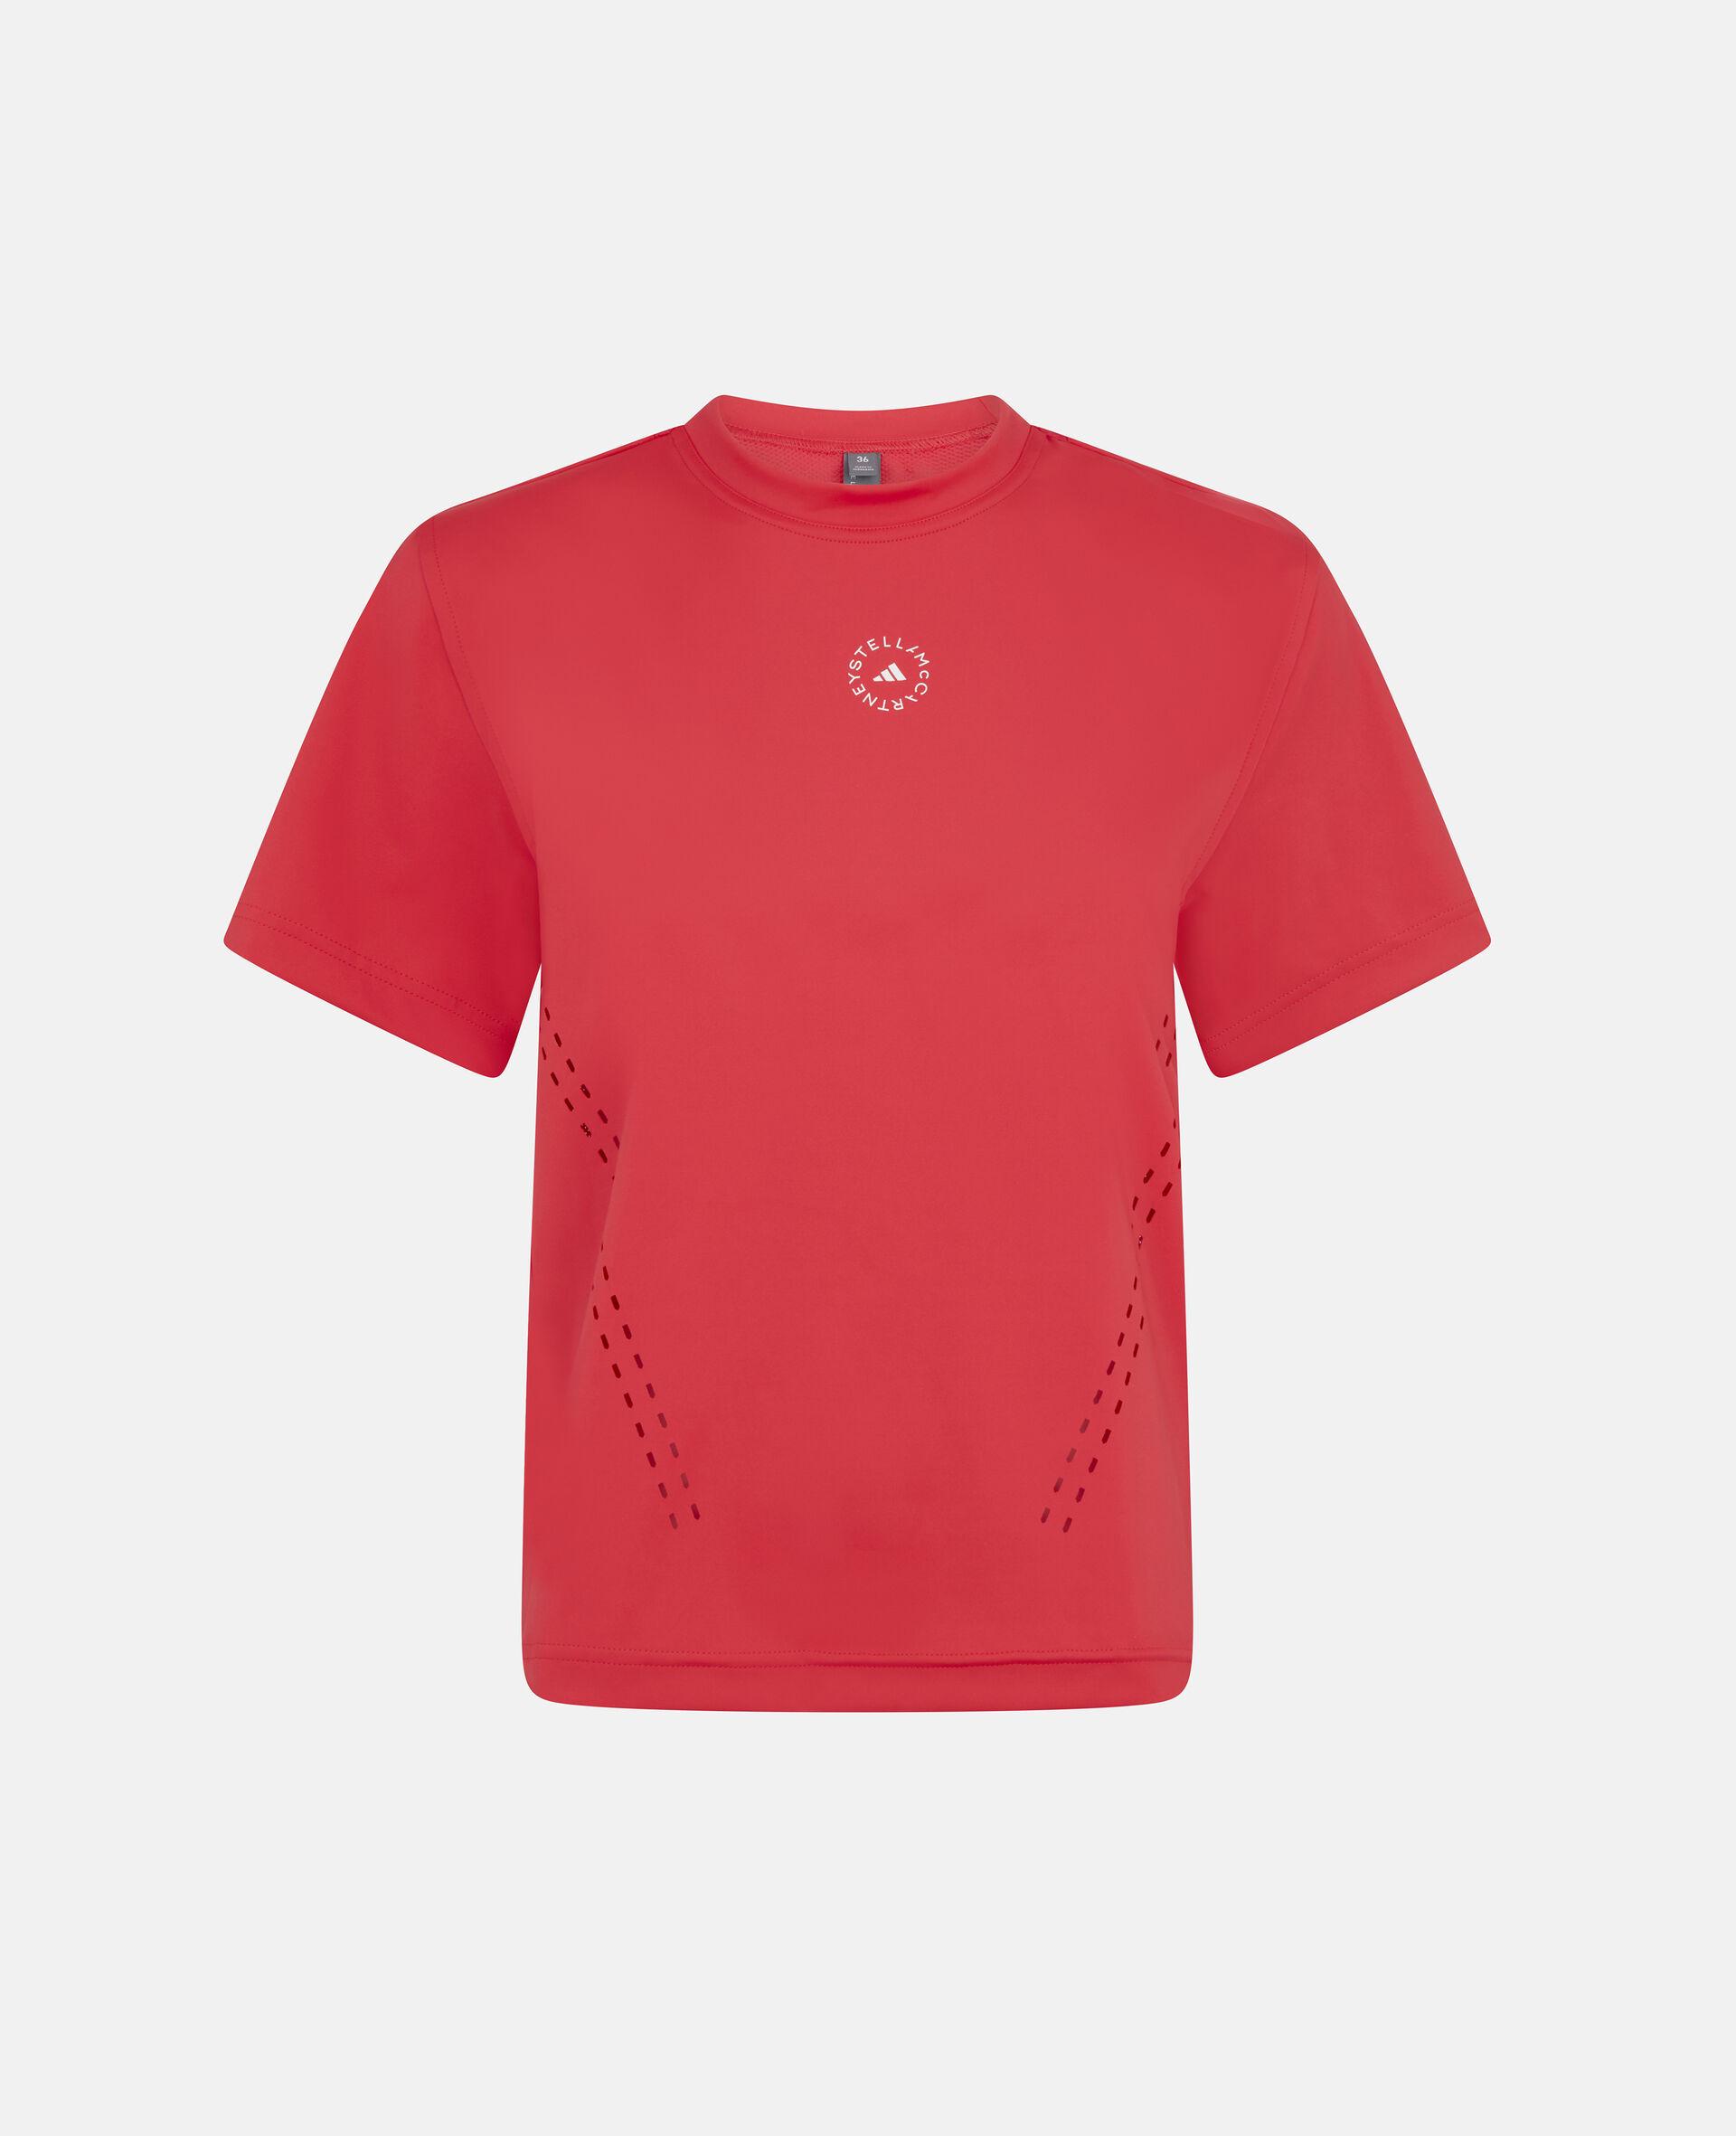 Rosa Trainings-T-Shirt-Rose-large image number 0